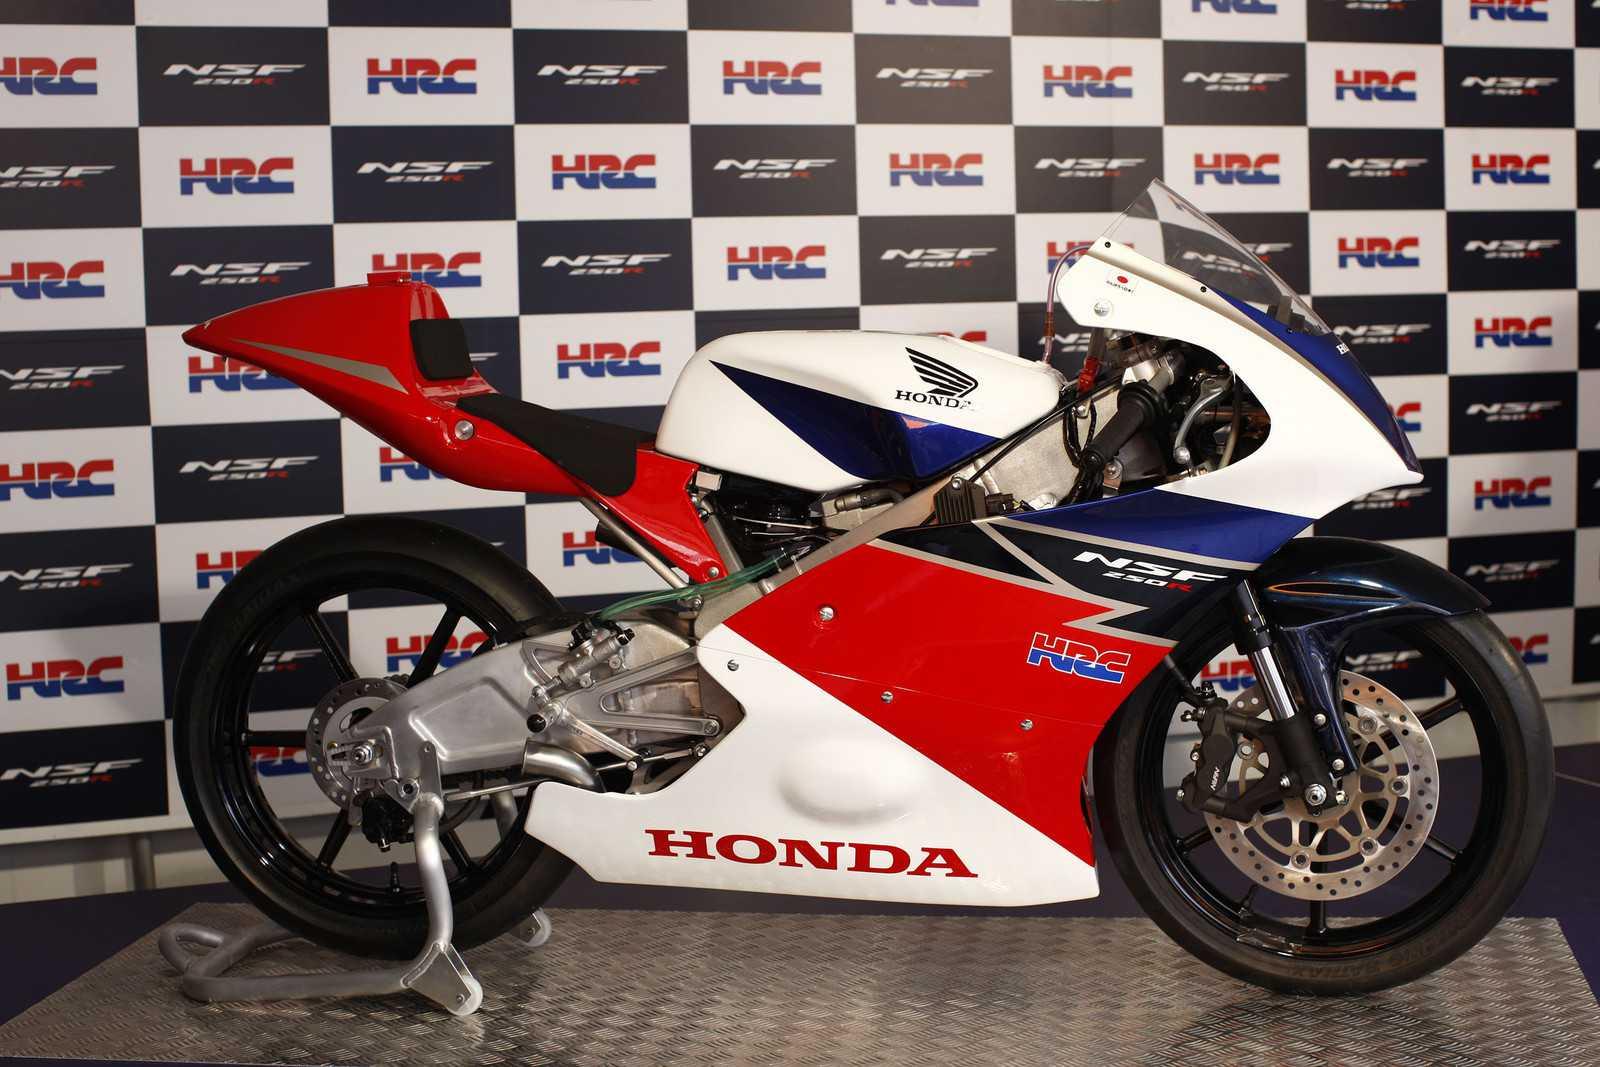 Fim Cev Repsol Announces New European Talent Cup On Spec Honda Nsf250r Motorcycles Roadracing World Magazine Motorcycle Riding Racing Tech News